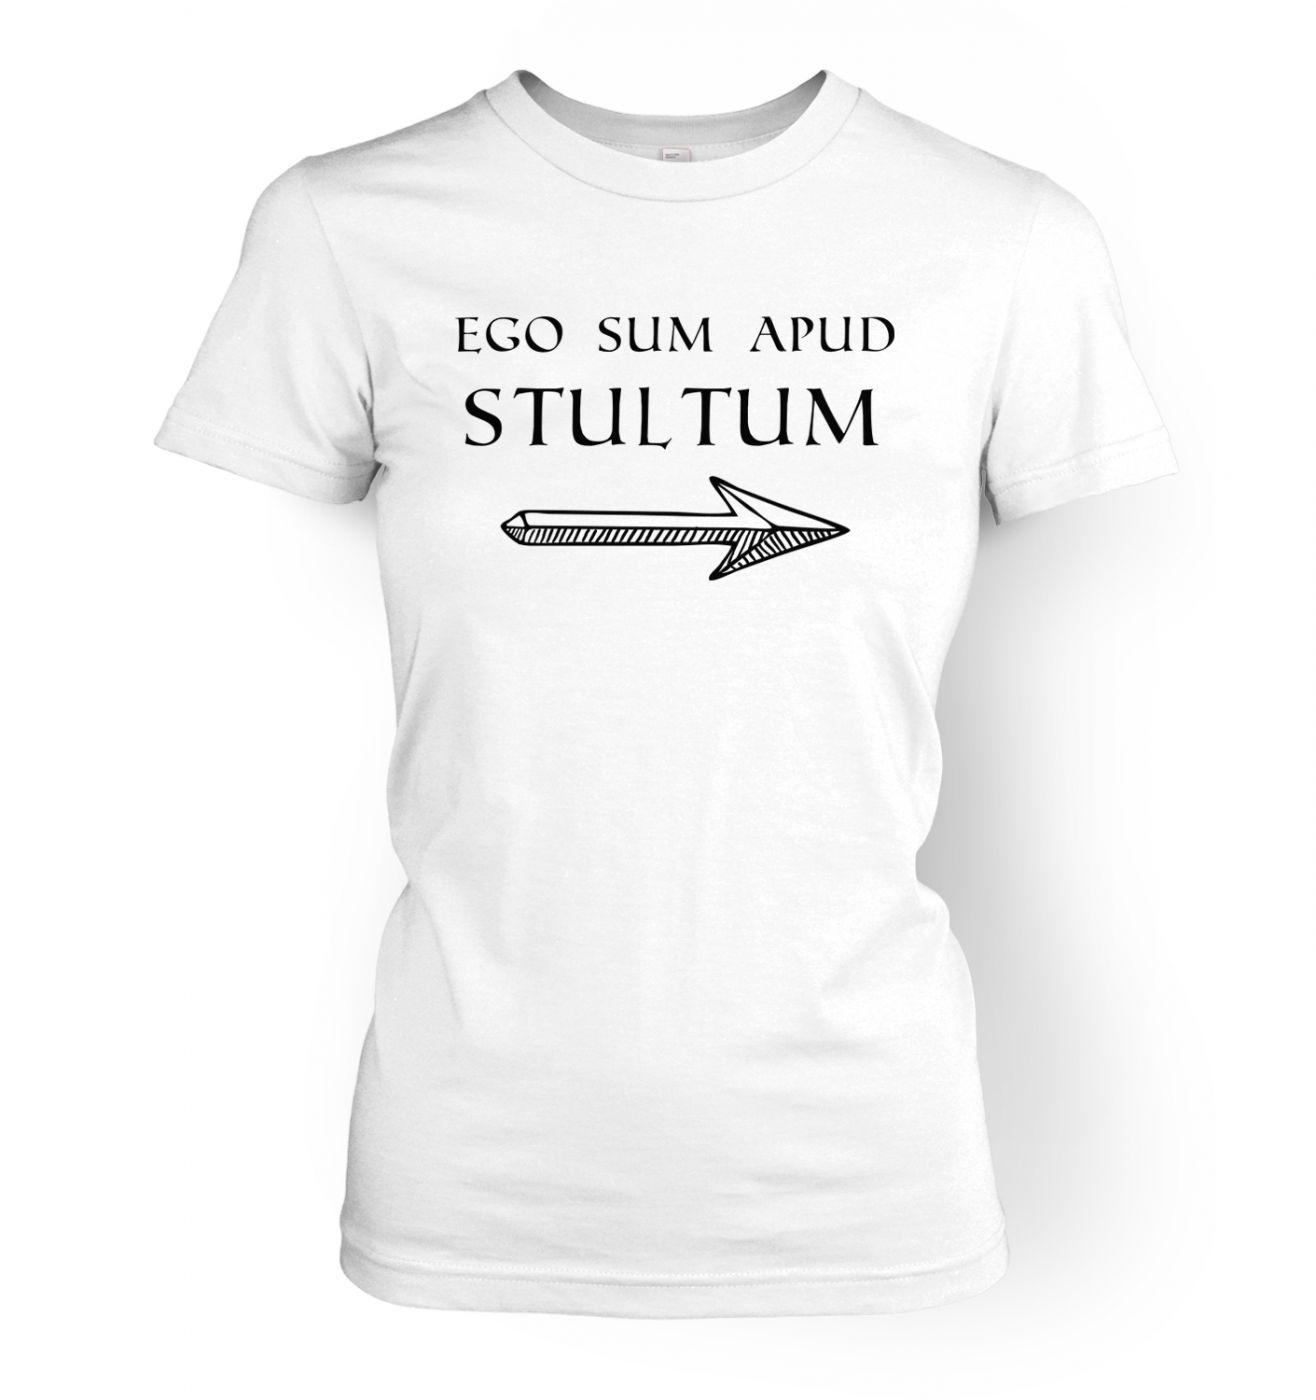 Ego Sum Apud Stultum women's t-shirt